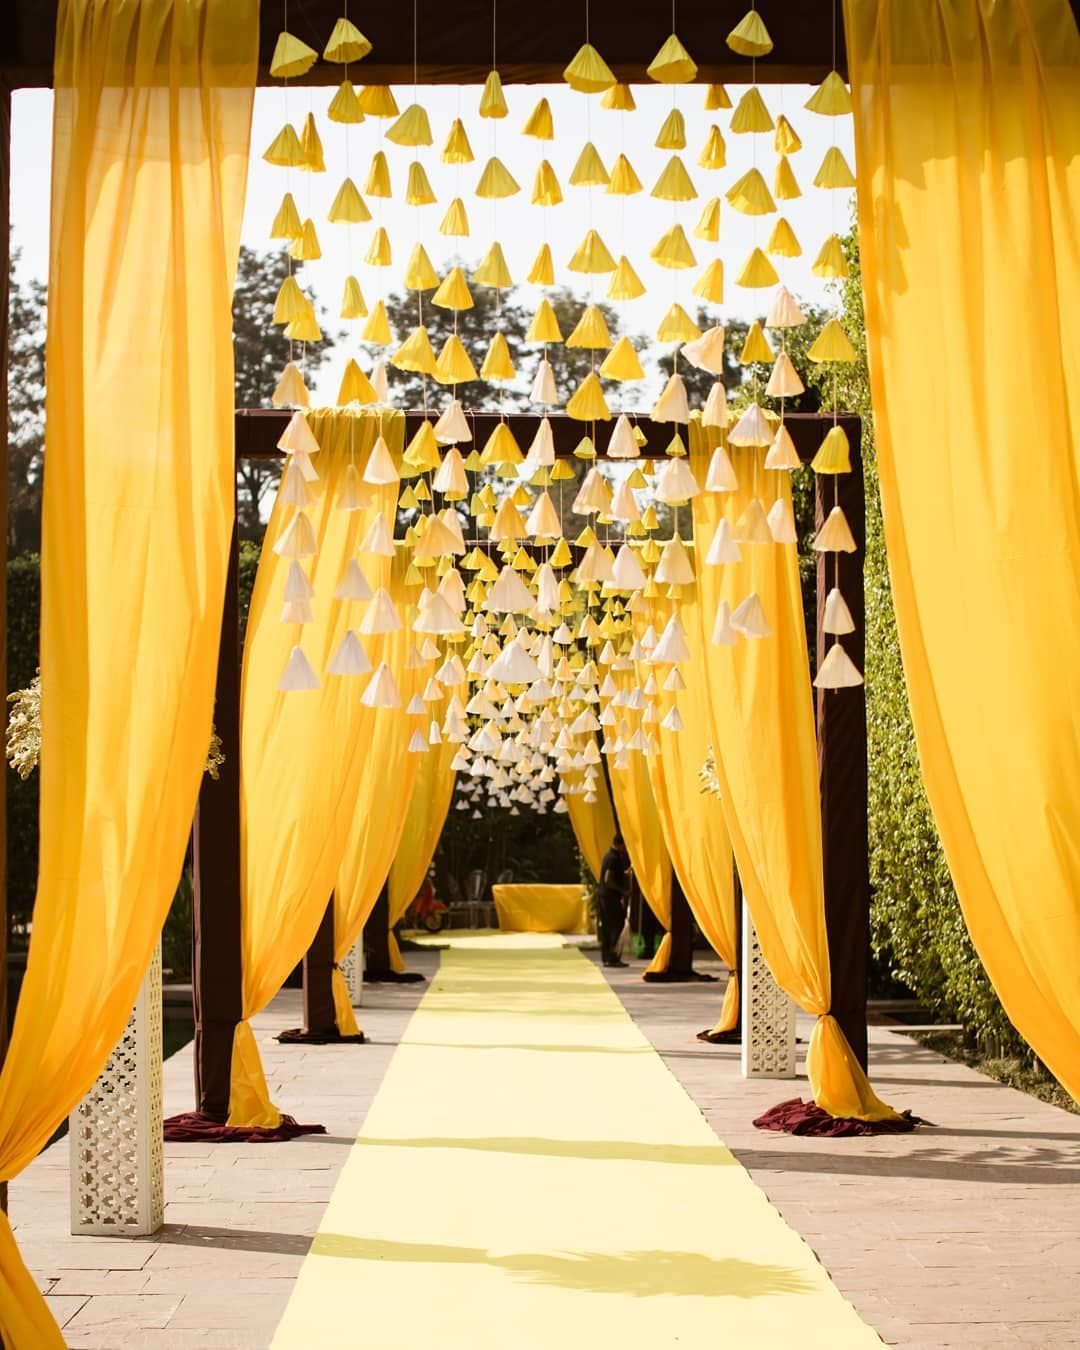 New Mehendi Decor Trends This Wedding Season!